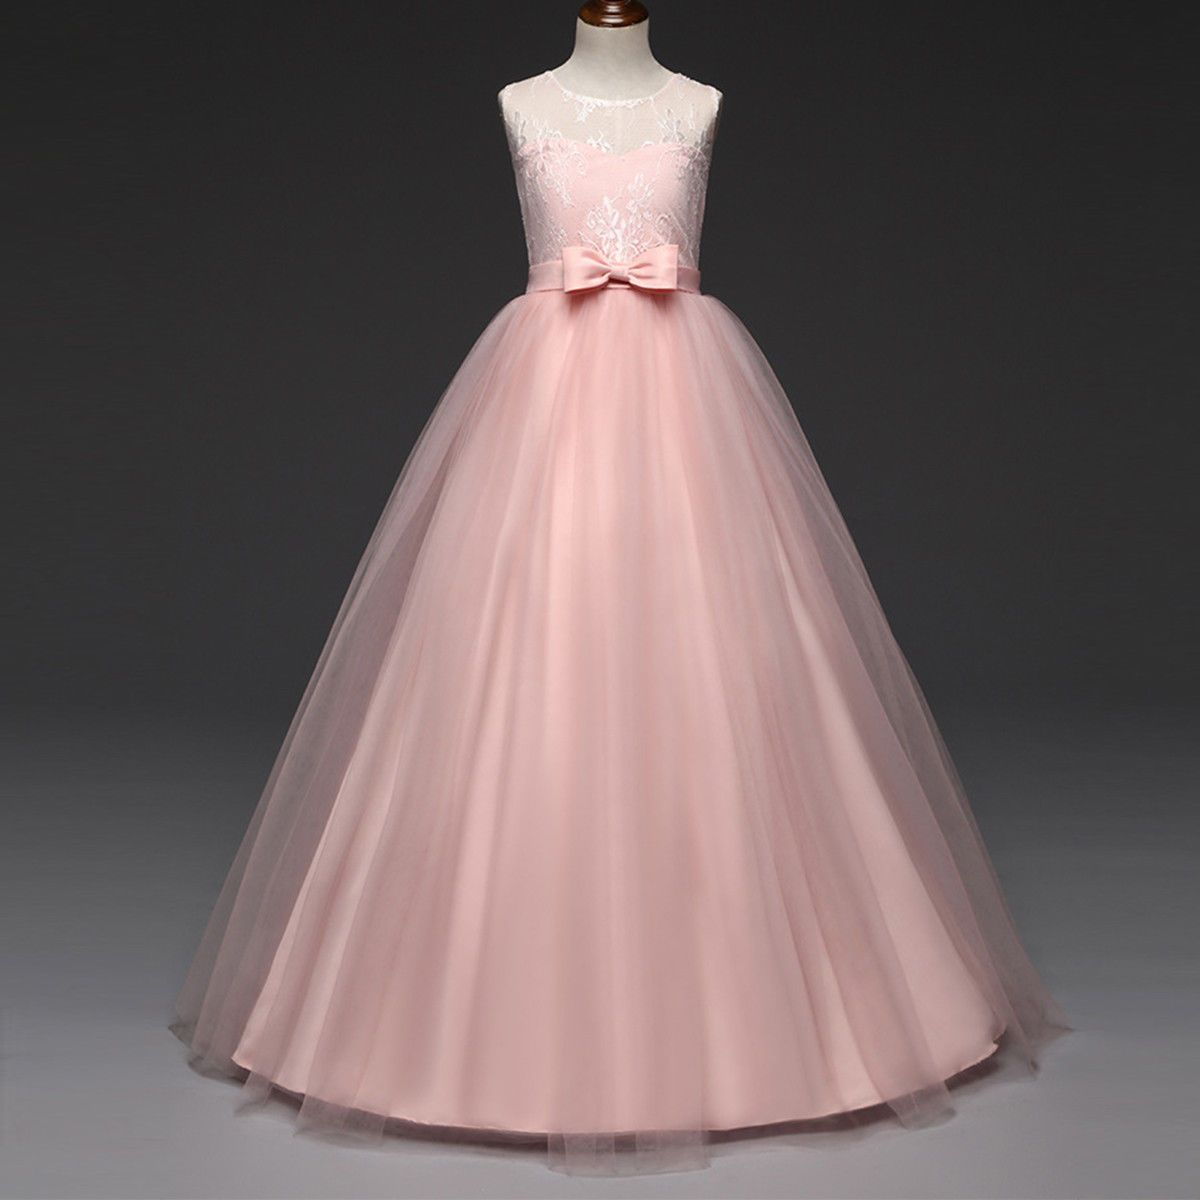 Flower Girl Lace Long Wedding Bridesmaid Dress Kids Princess Pageant ...